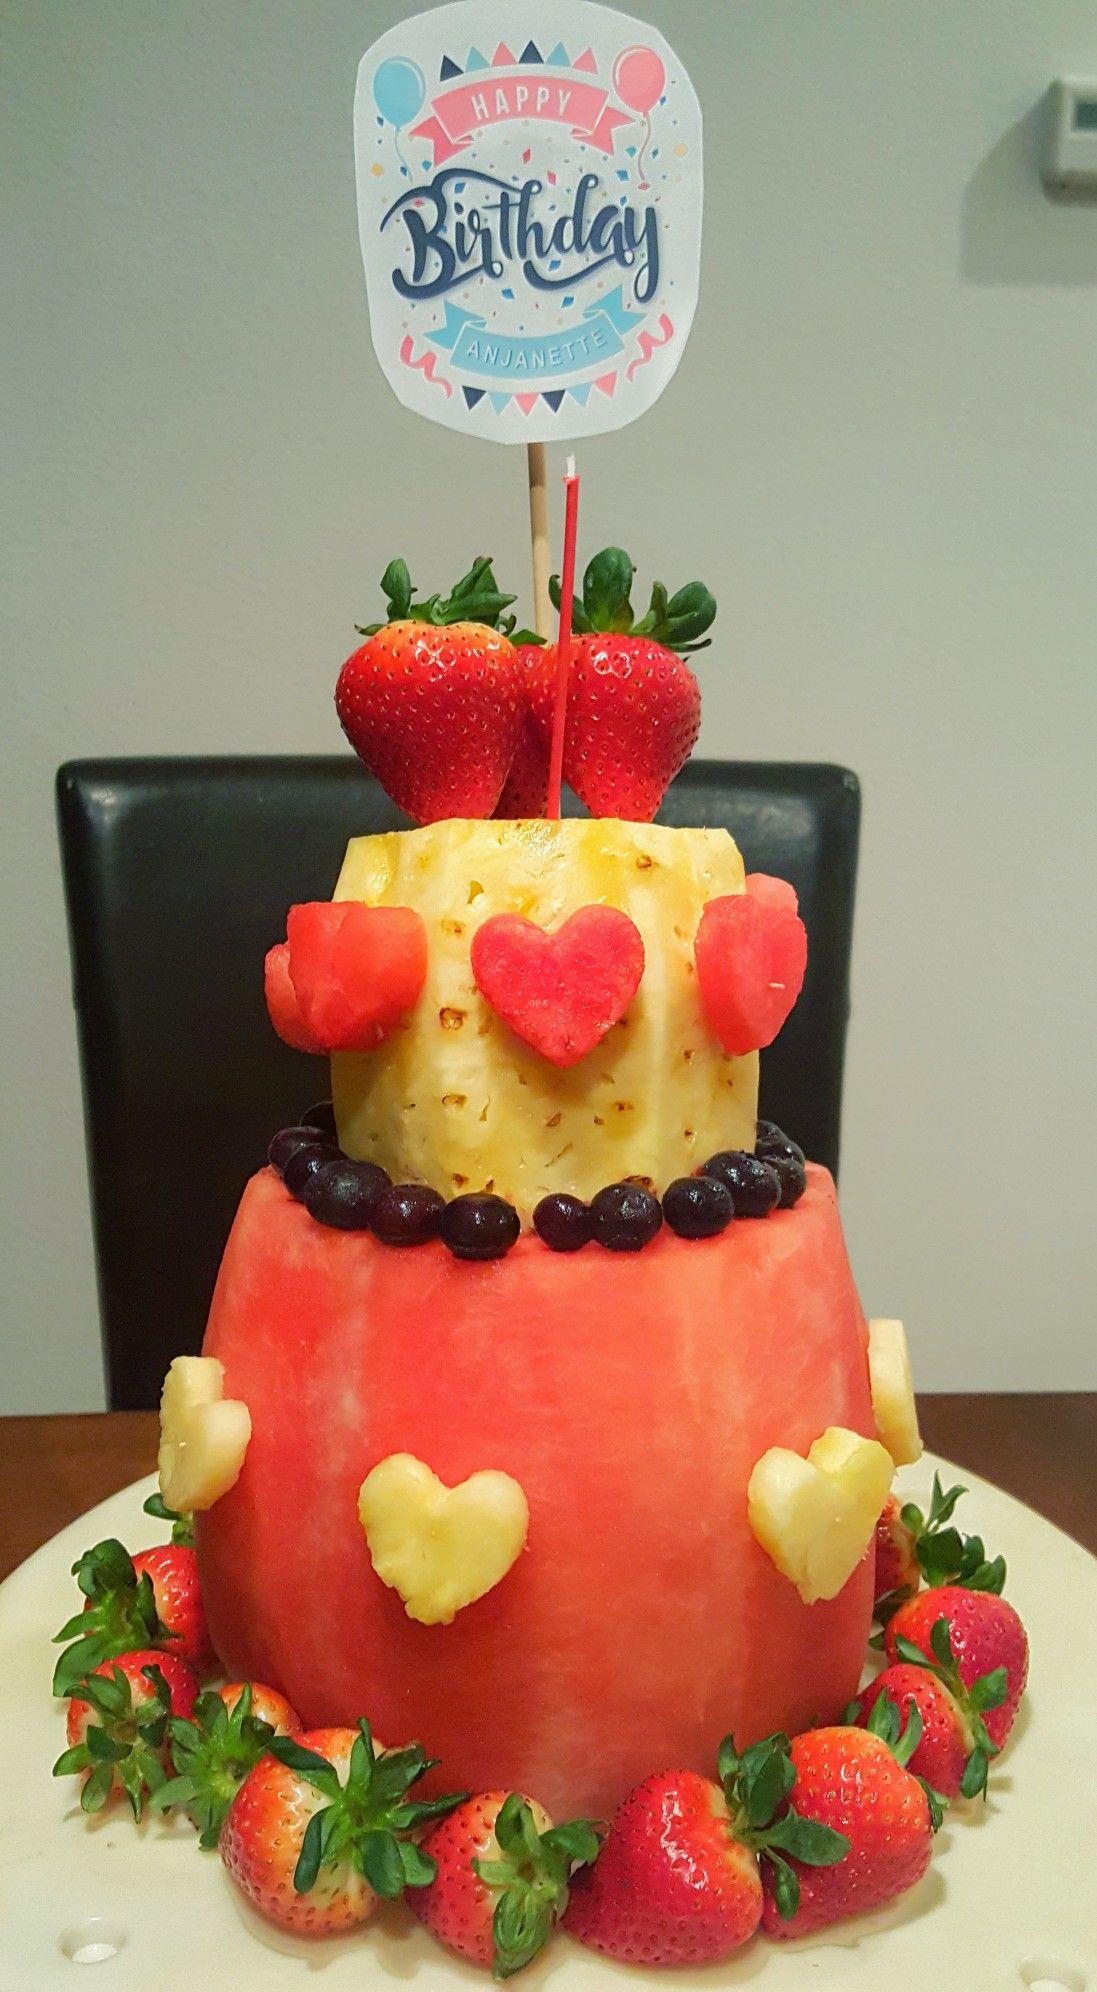 Pin By Mary On Healthy Birthday Cake Alternative Pinterest